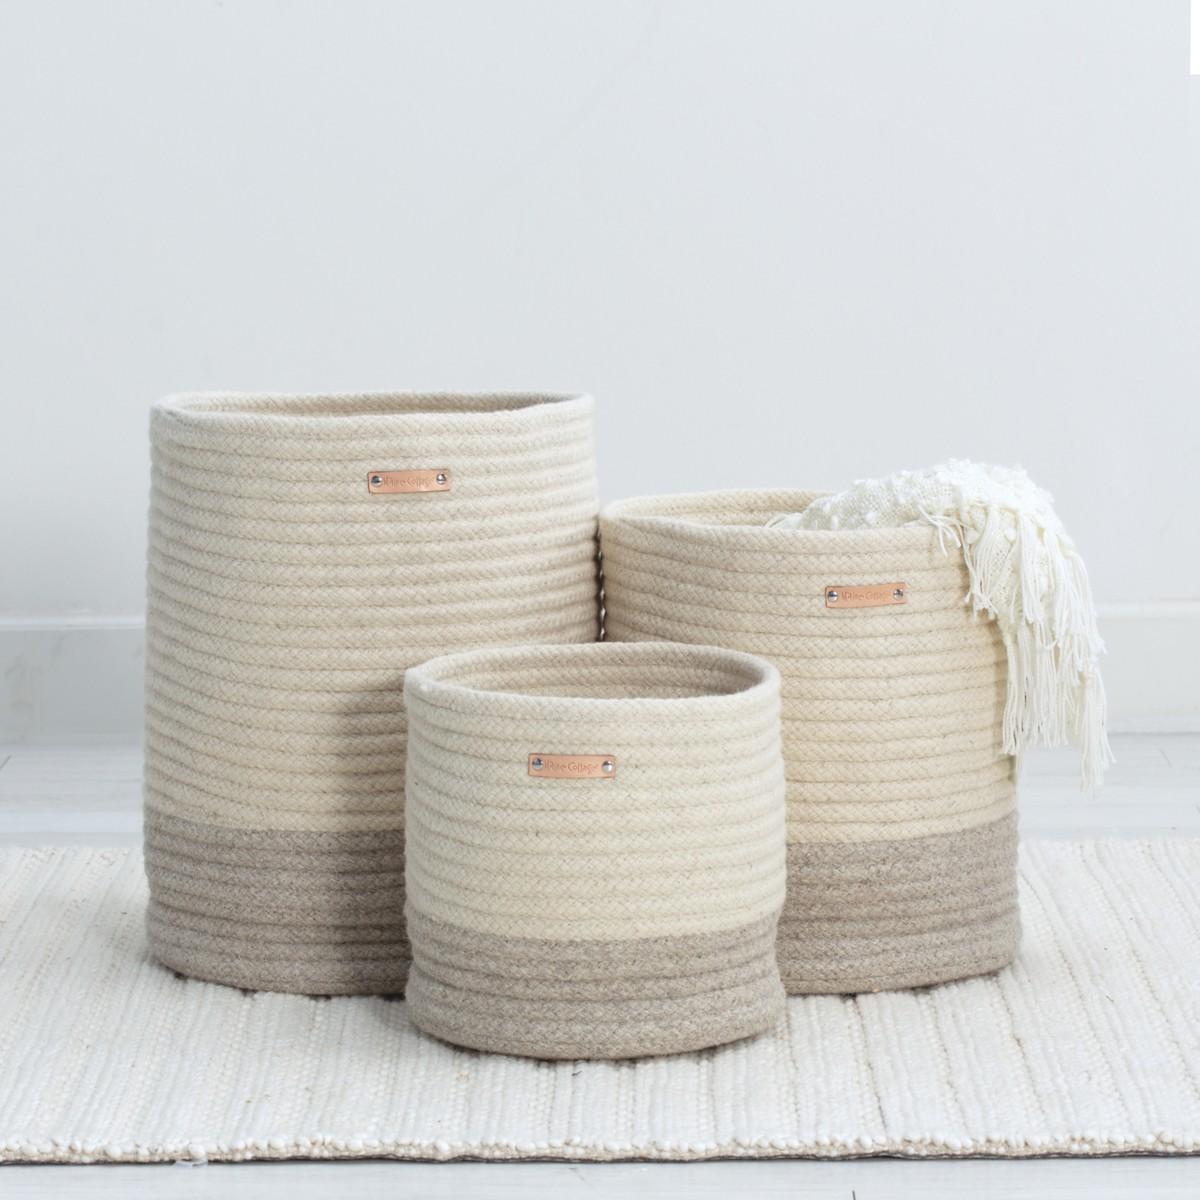 Little Braided Wool Basket - Two Tone